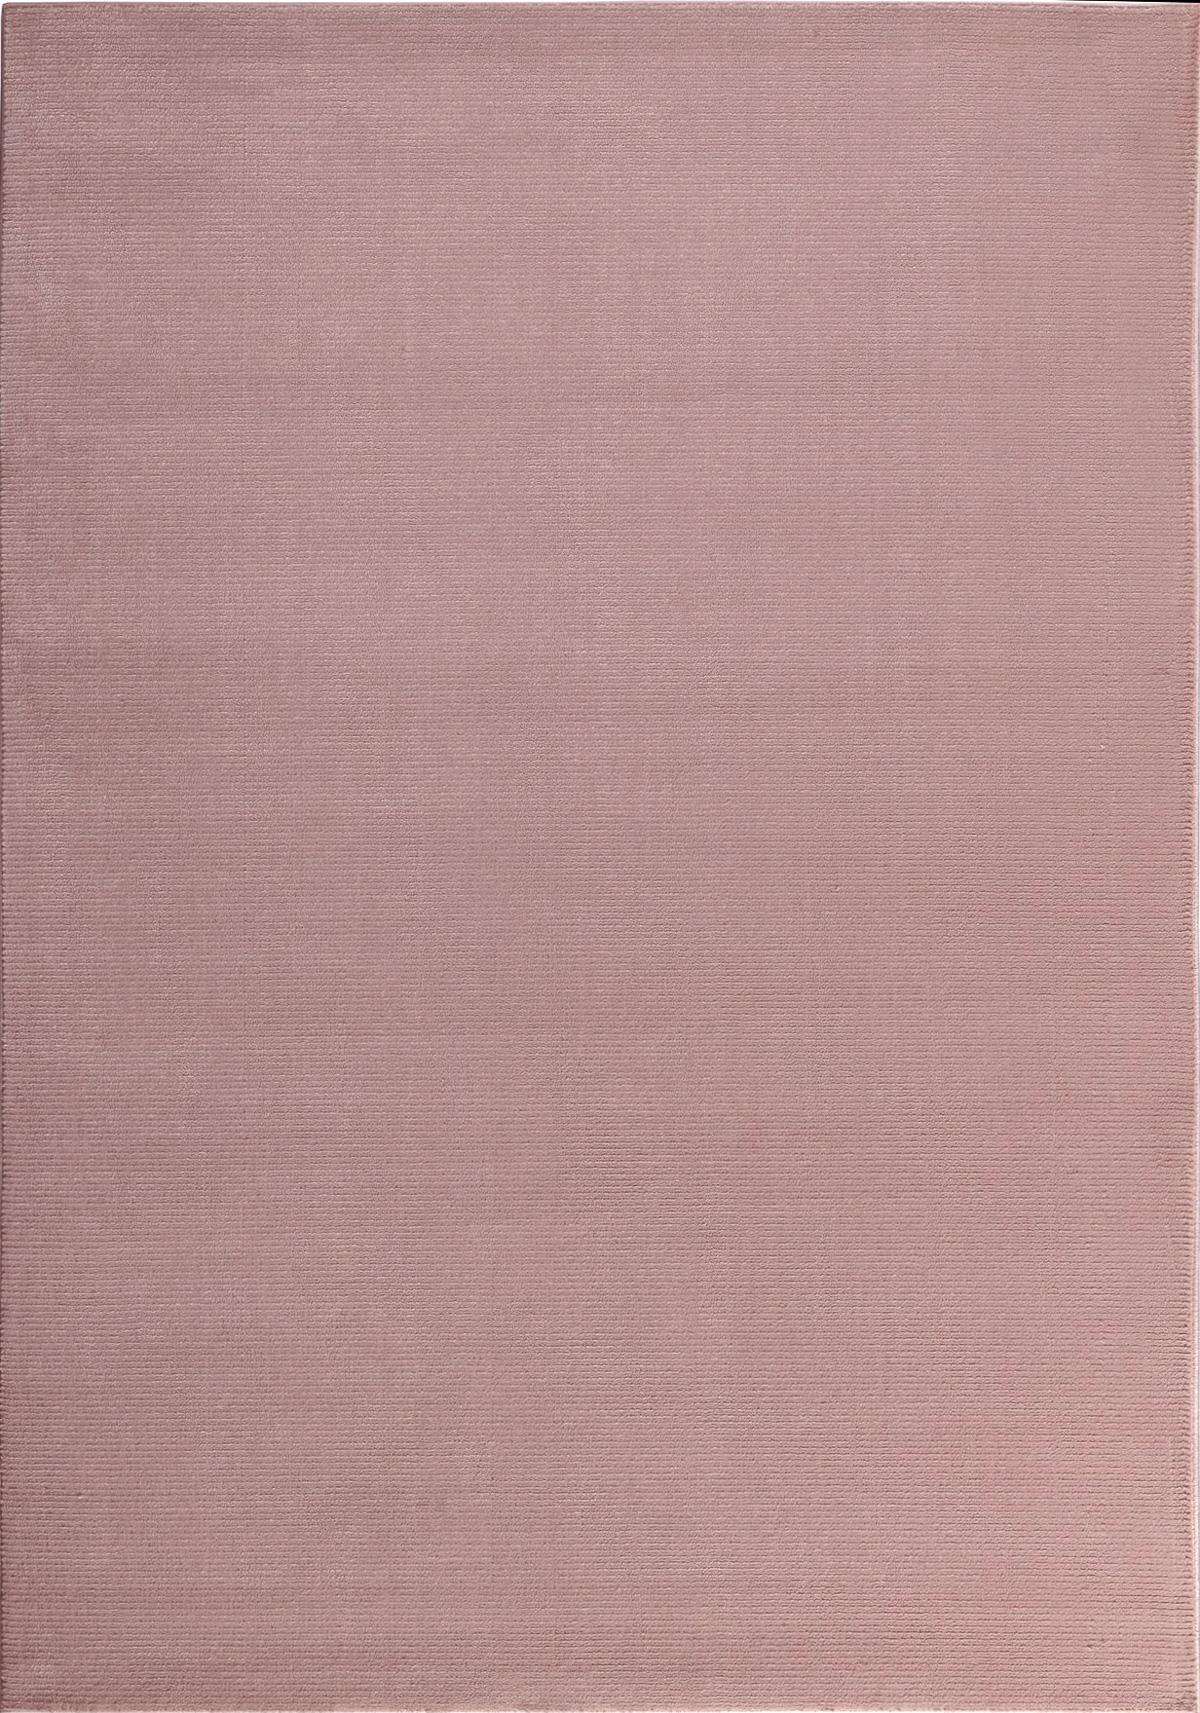 Tapis moderne uni doux rose 120x170